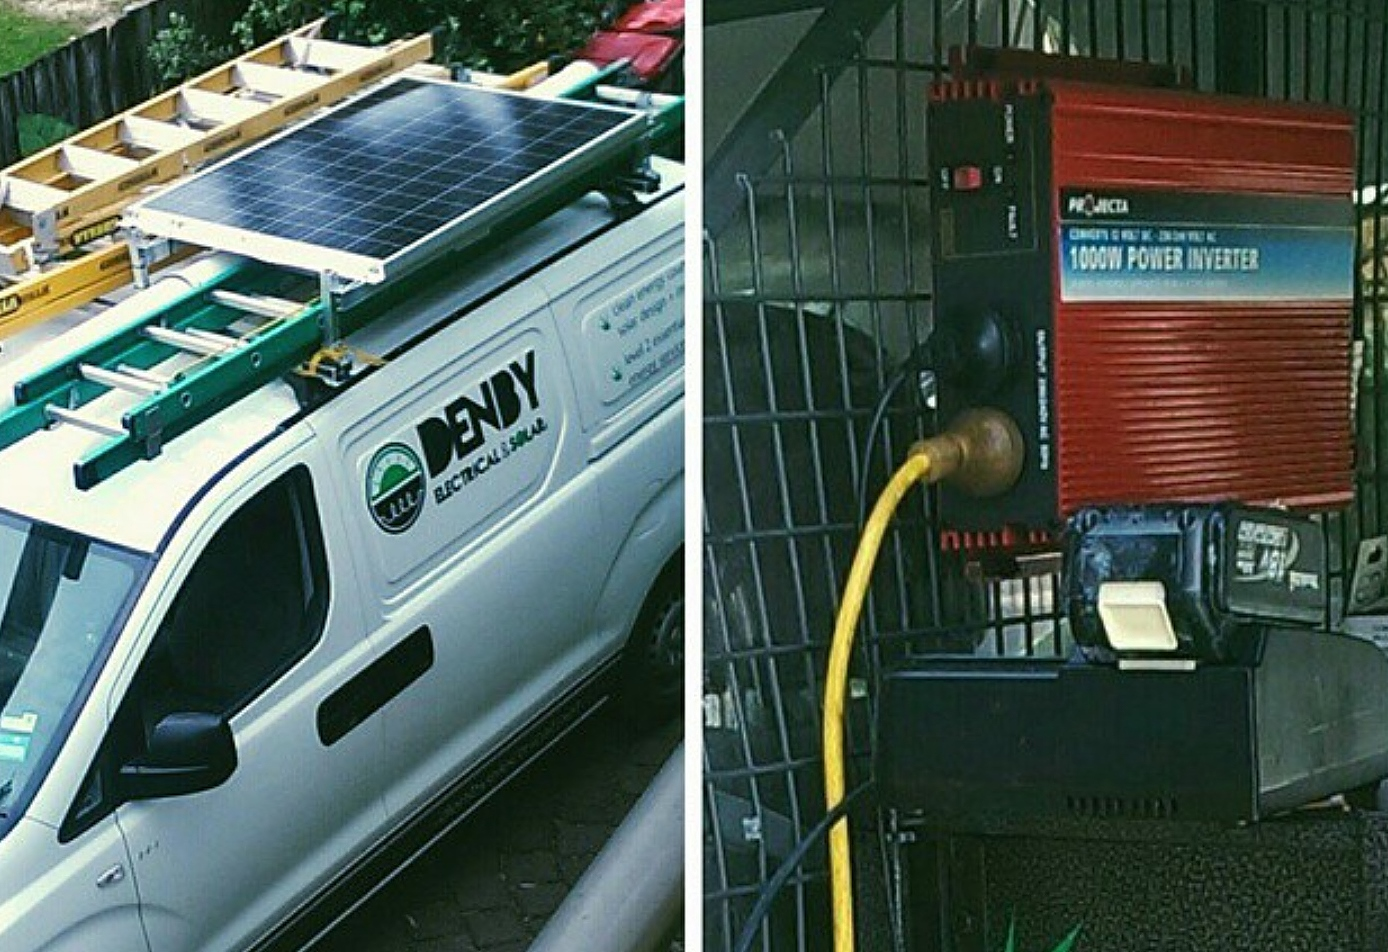 Mobile solar panel on van